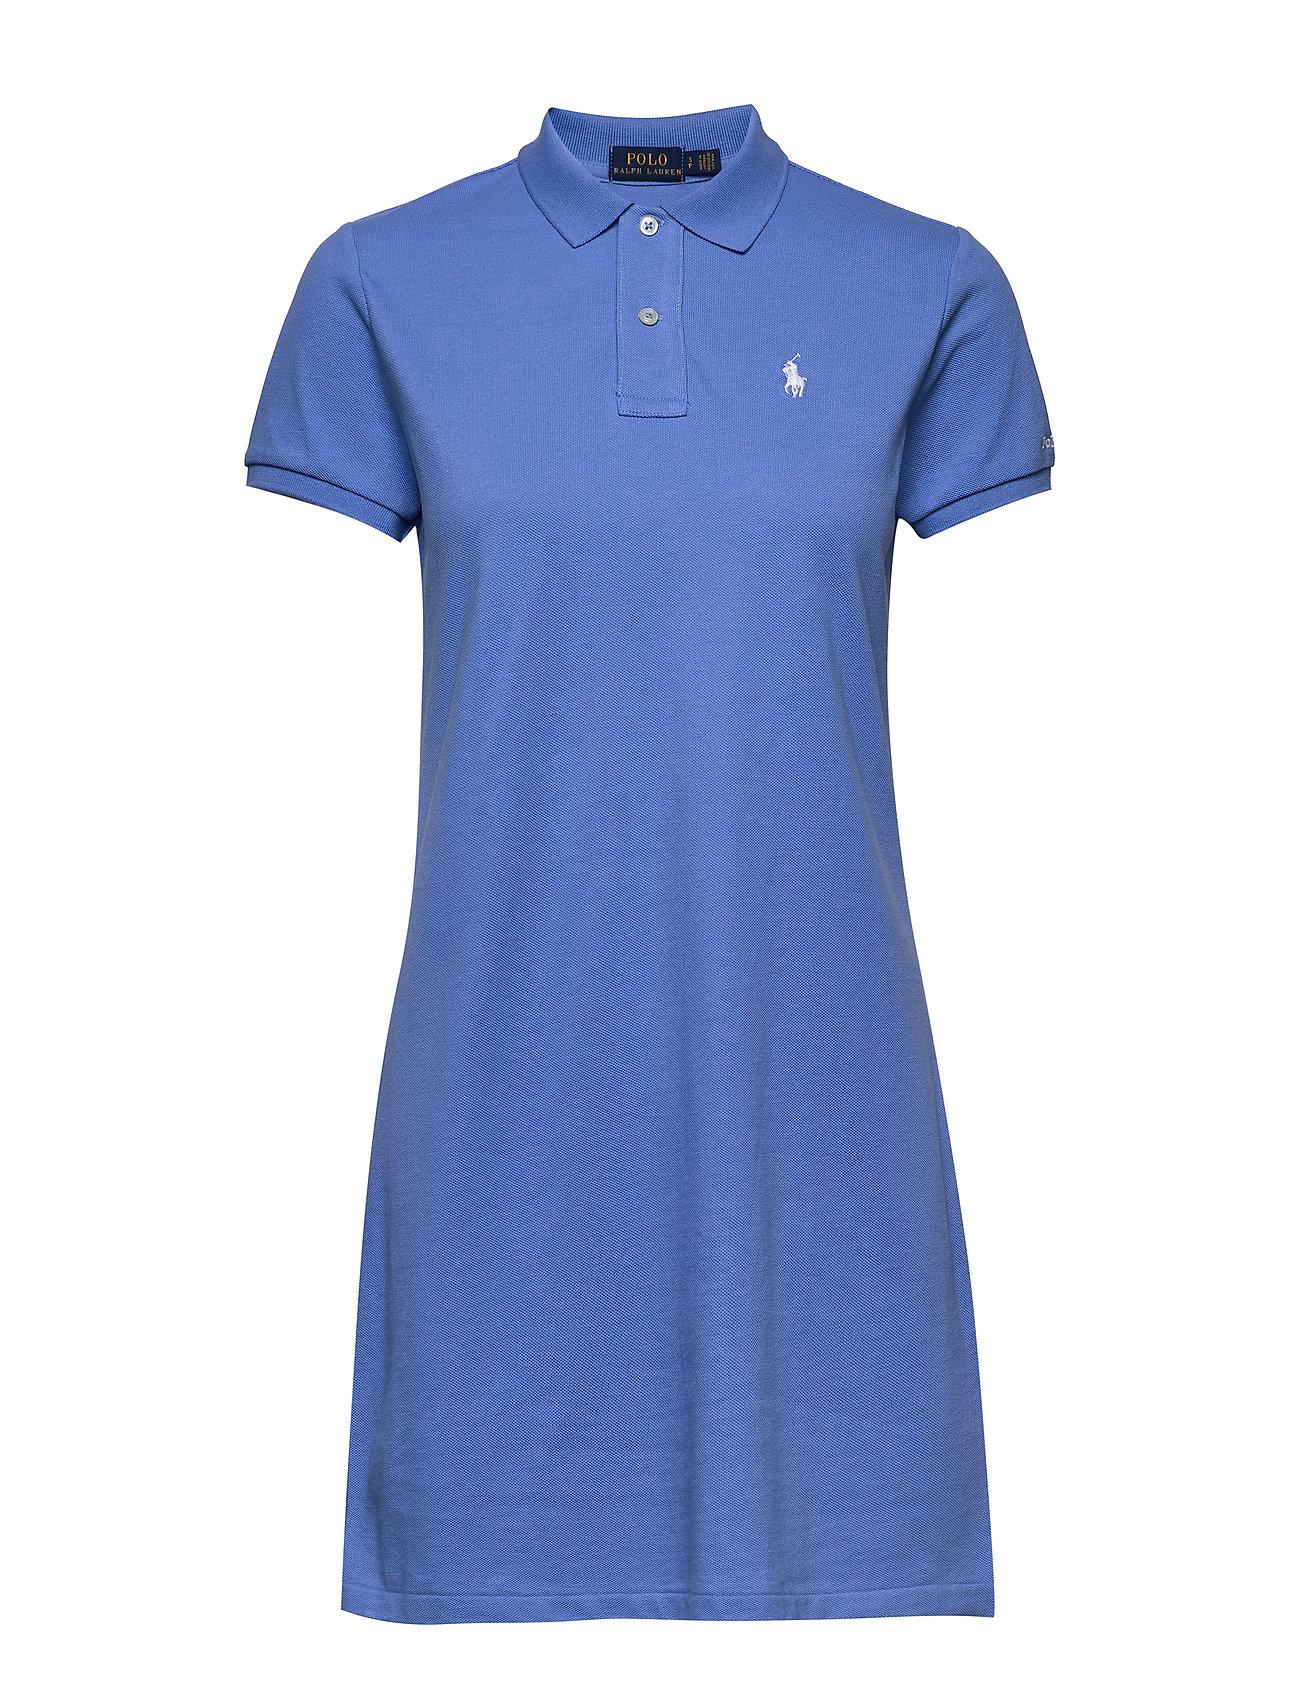 Polo Ralph Lauren Cotton Polo Dress - HARBOR ISLAND BLU